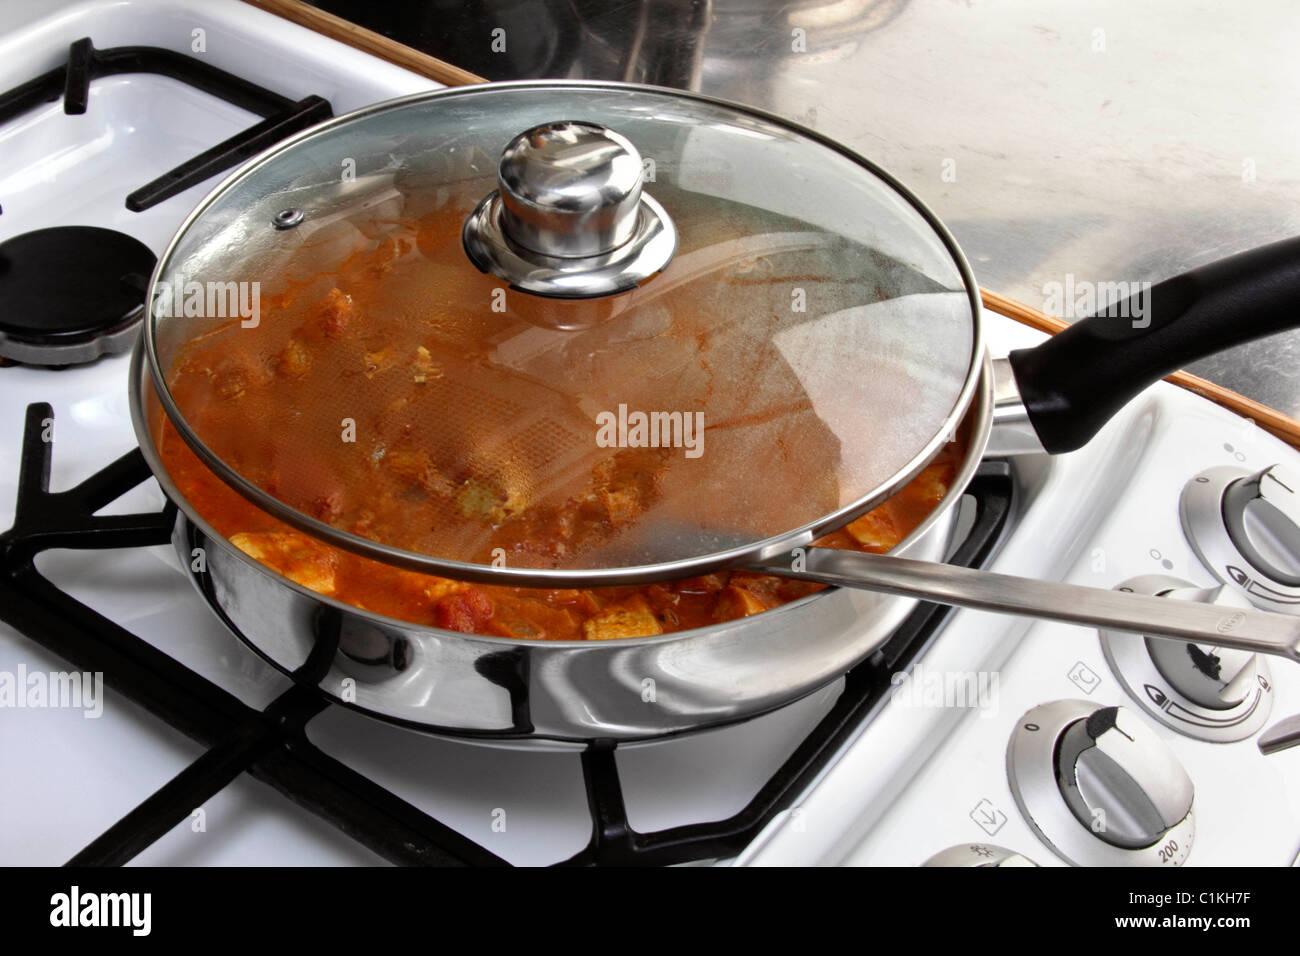 Chicken rogan josh cooking in pan - Stock Image